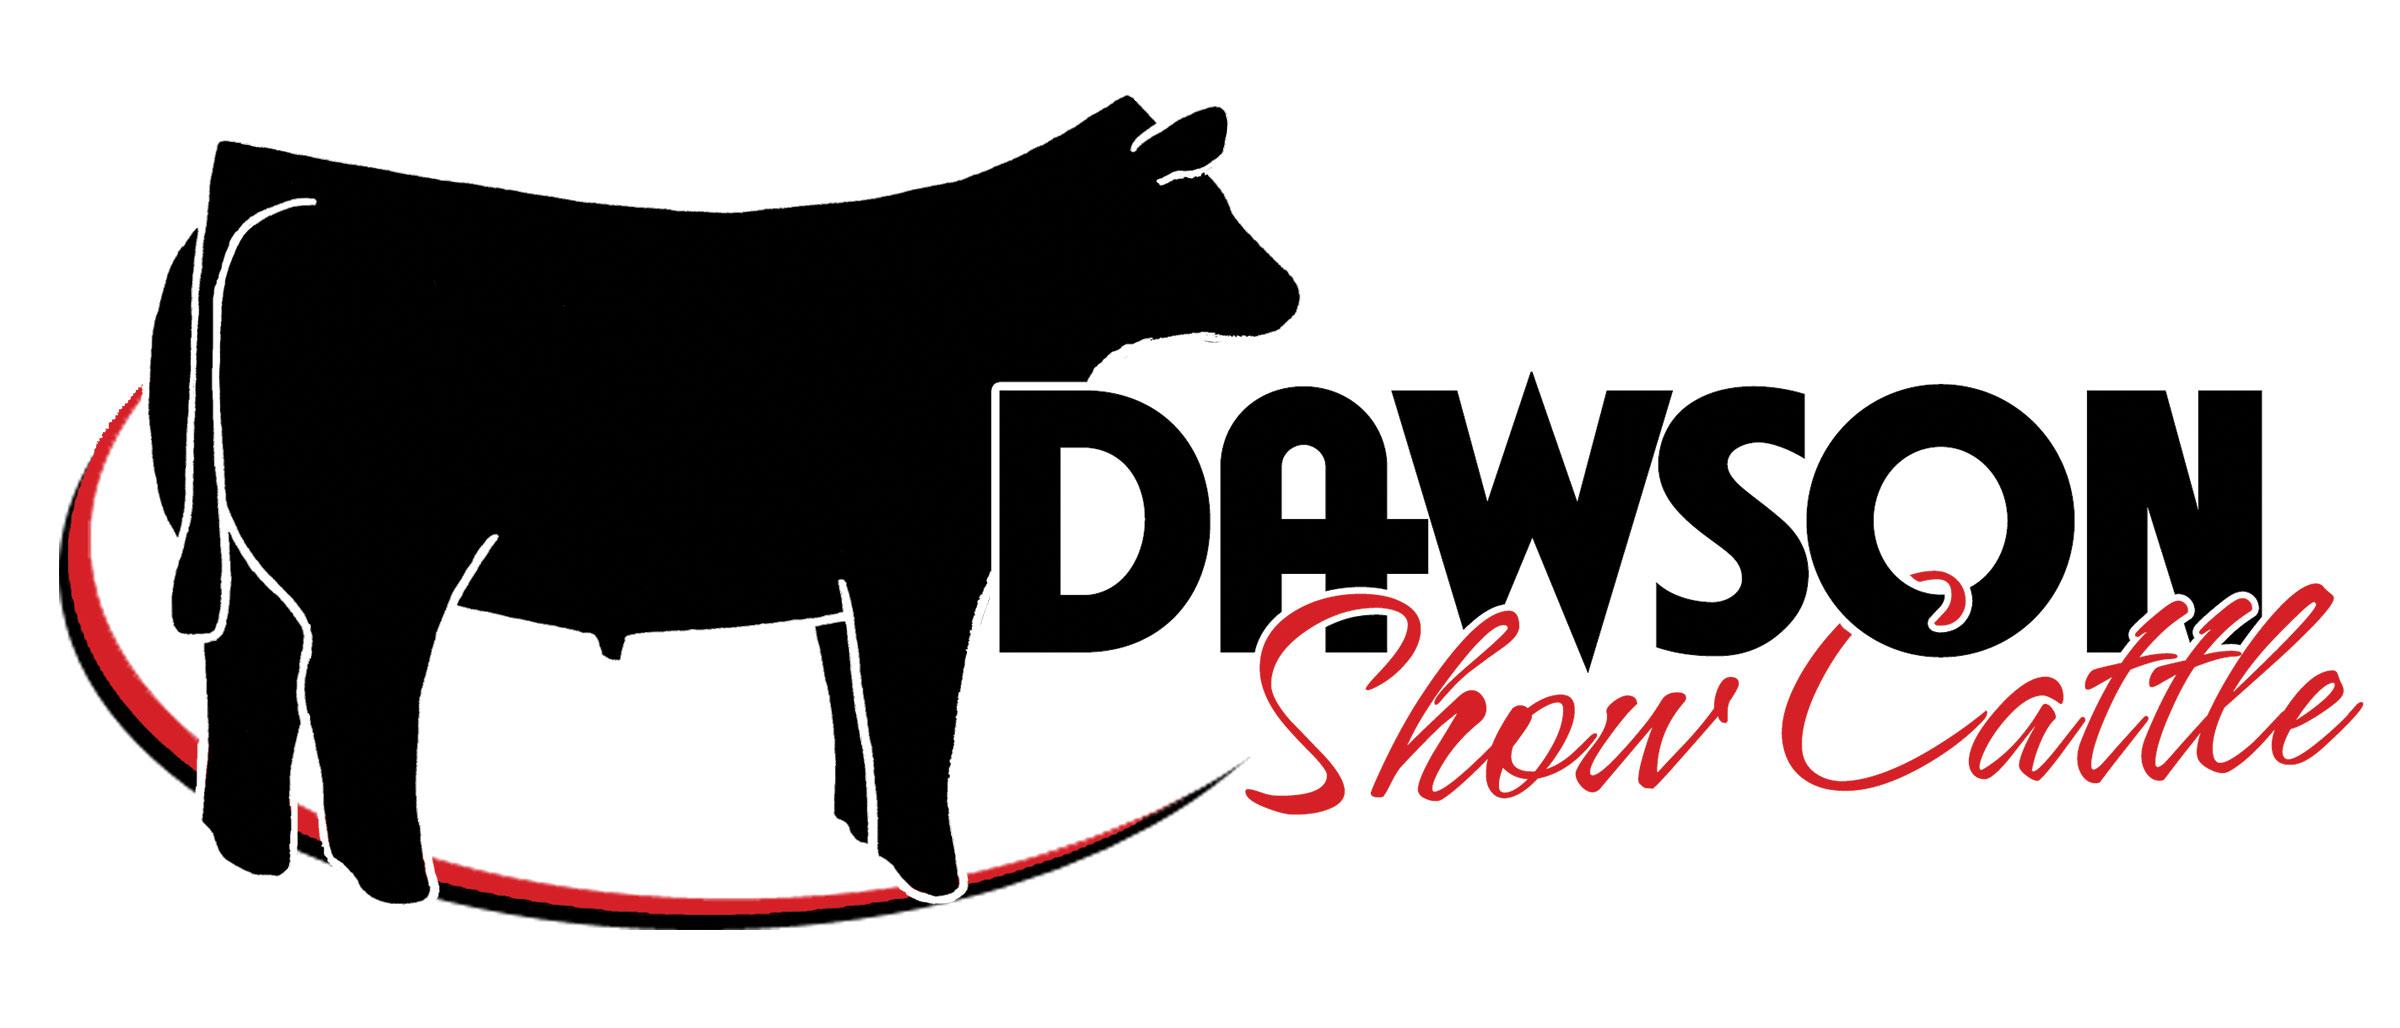 2400x1028 Dawson Show Cattle Logo By Ranch House Designs Logo